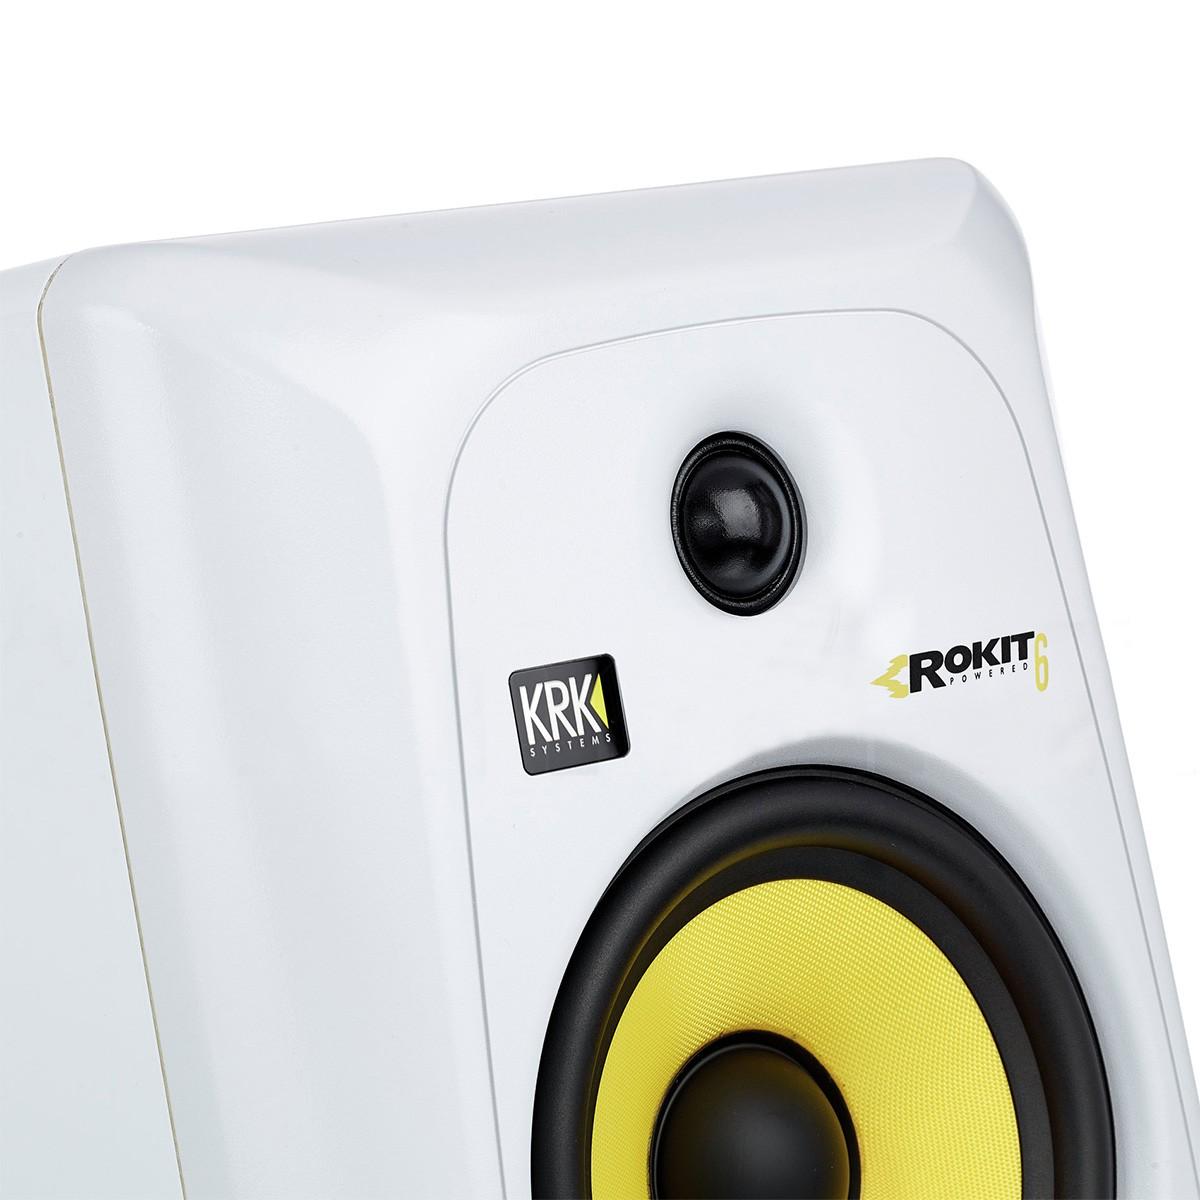 Krk RP6 G3 Rokit Powered Monitor de Audio Referencia para Estudio, Branco, 220v, Par